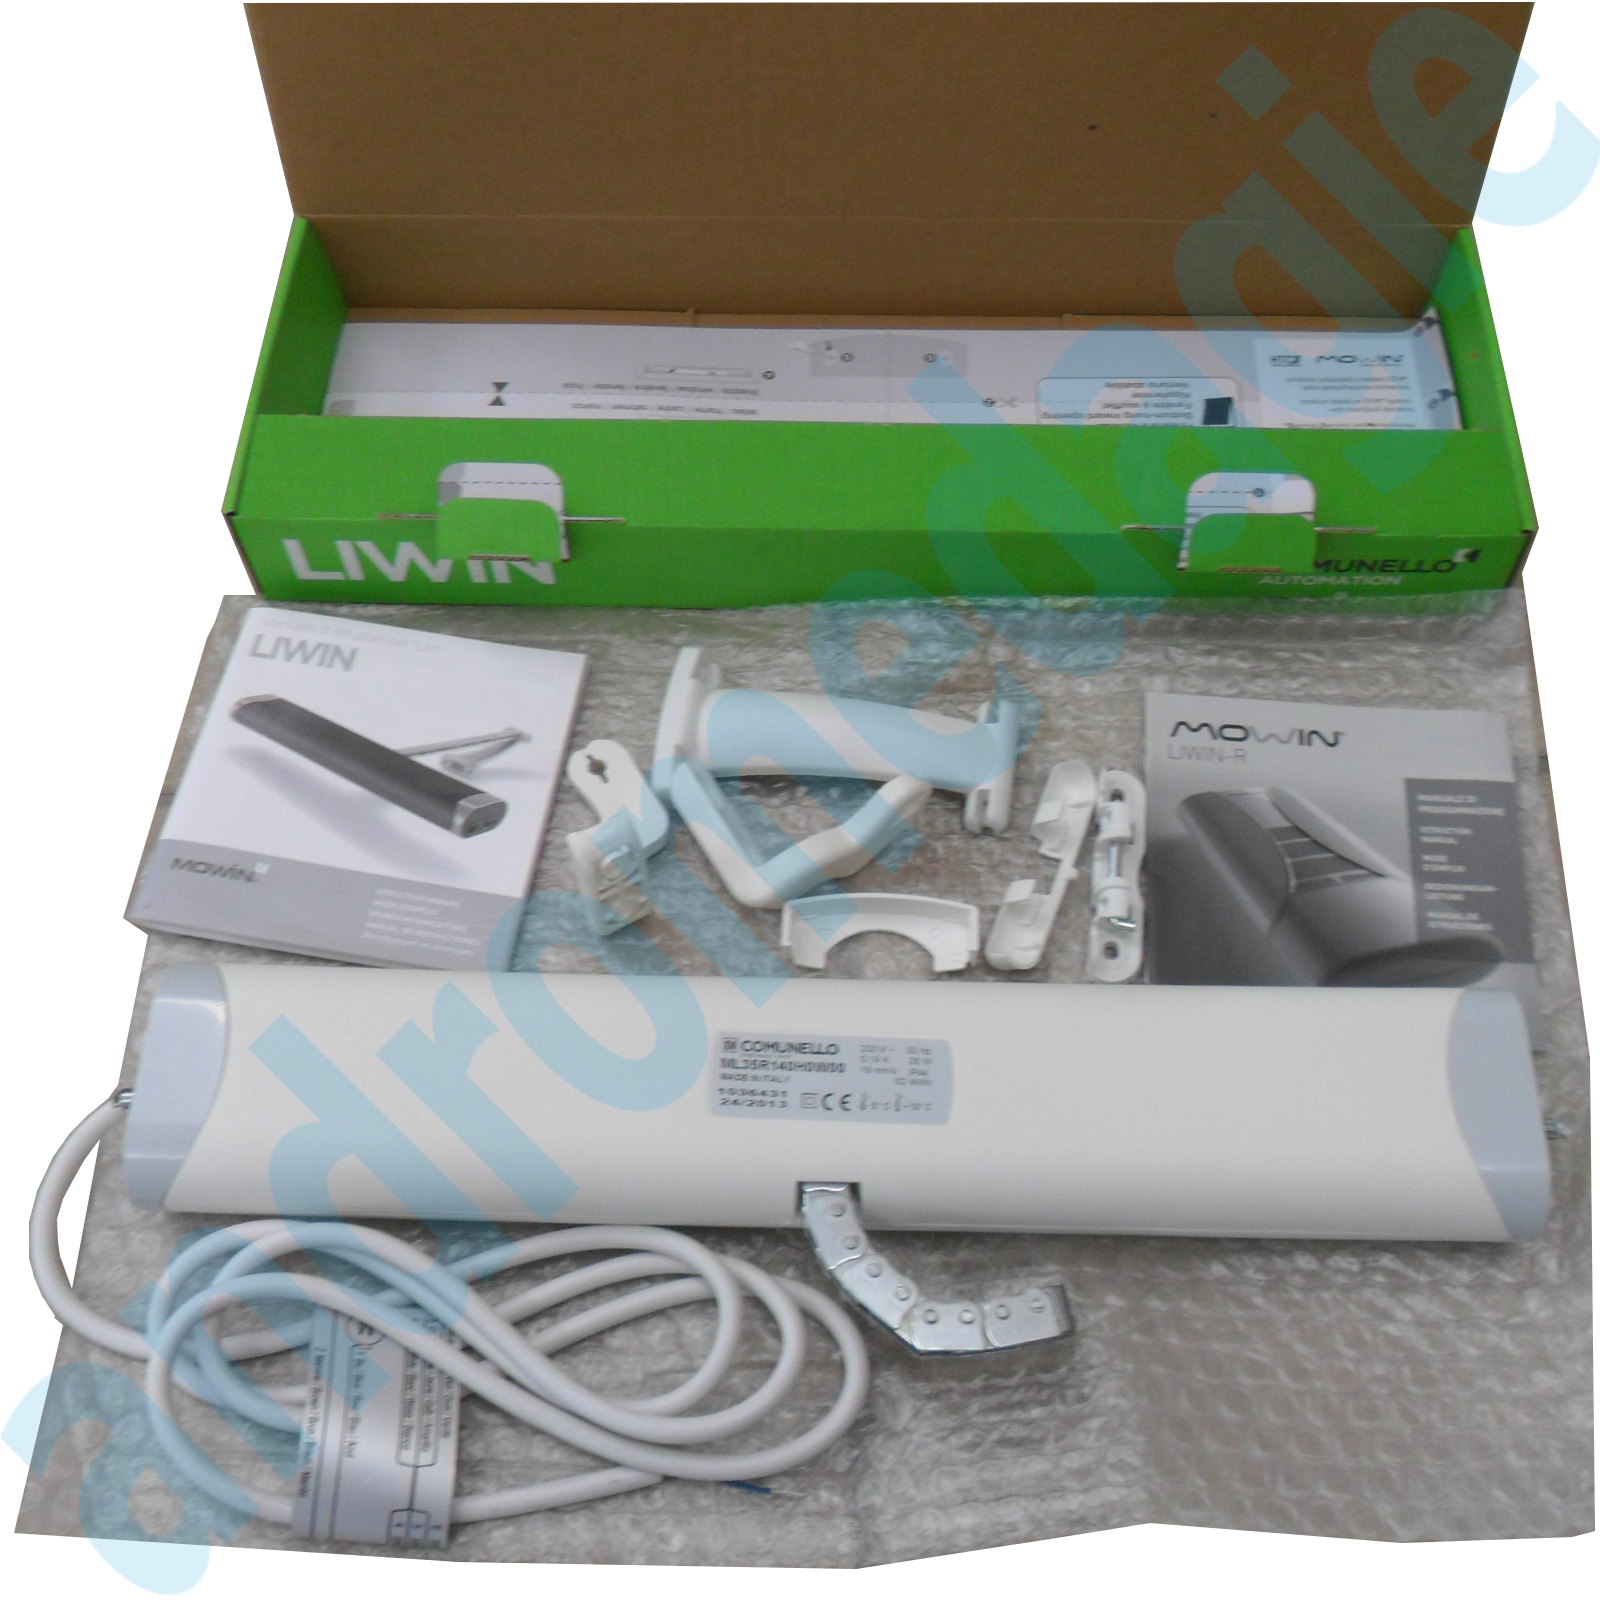 LIWIN 350N 230V RADIO